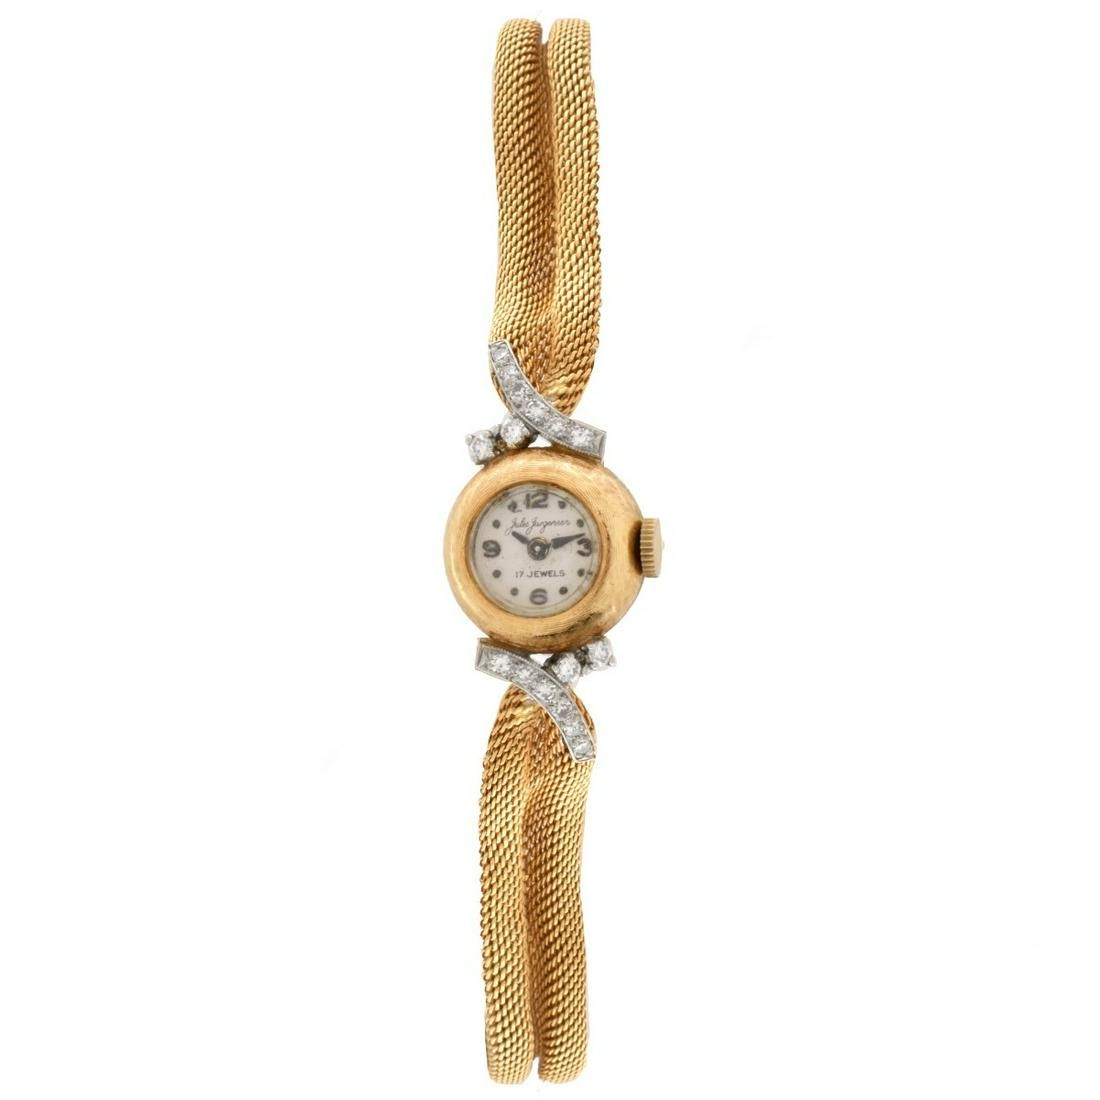 Lady's Jules Jurgensen 14K Watch